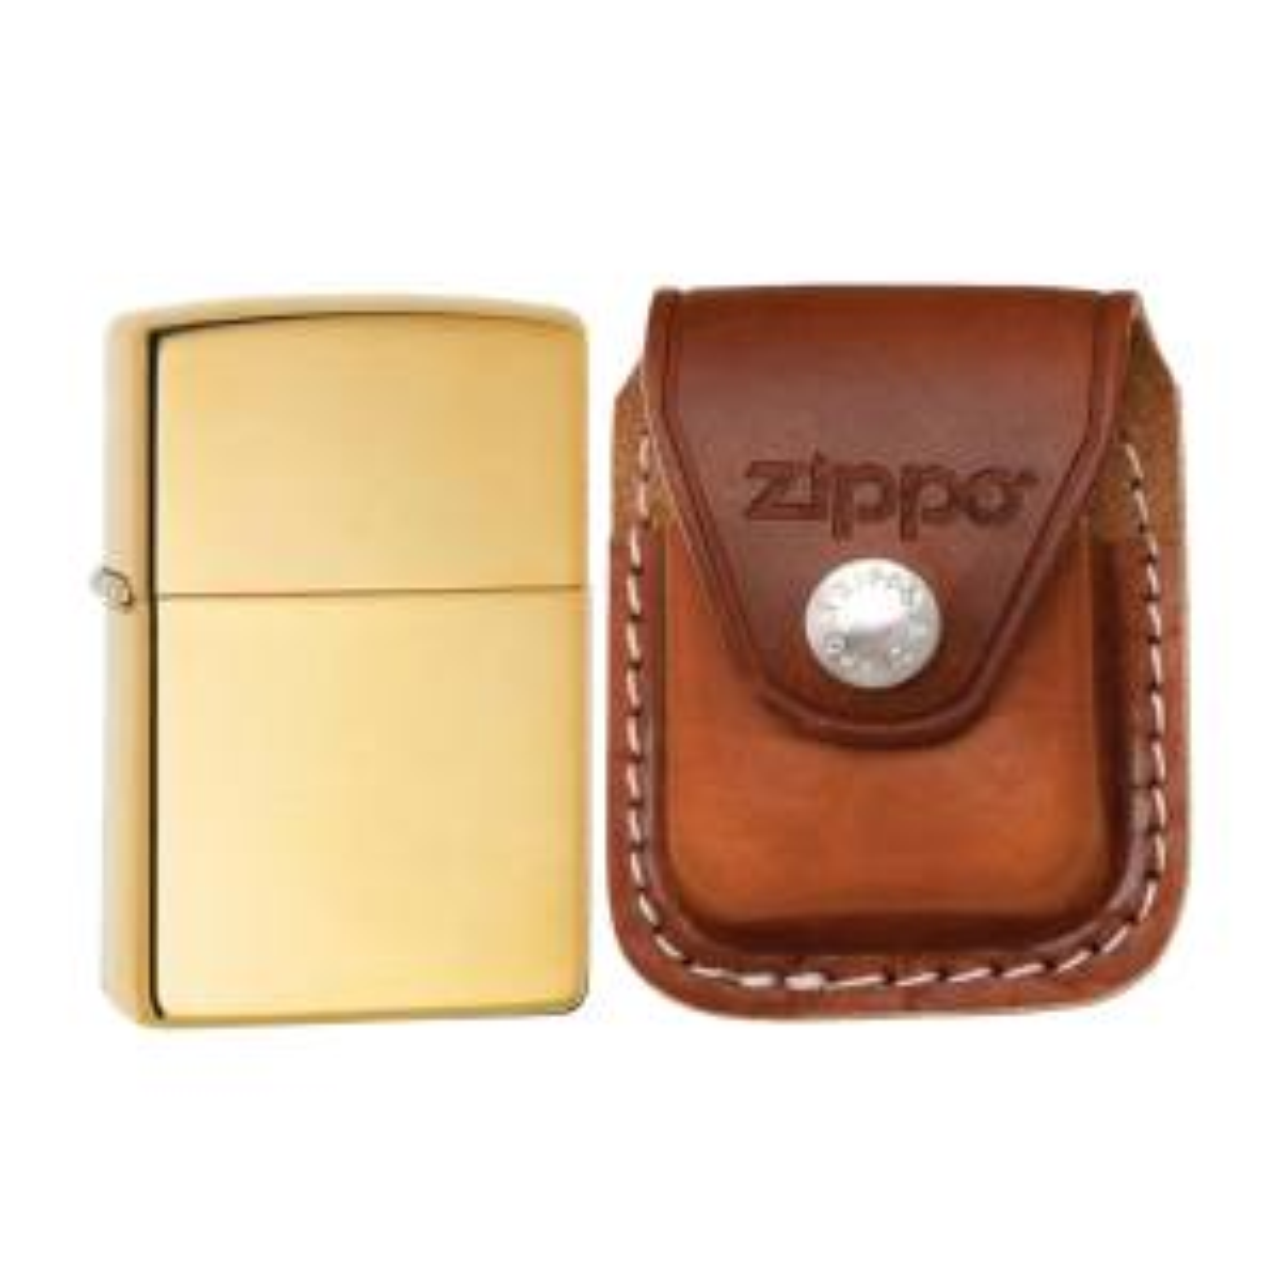 فندک زیپو کد 169